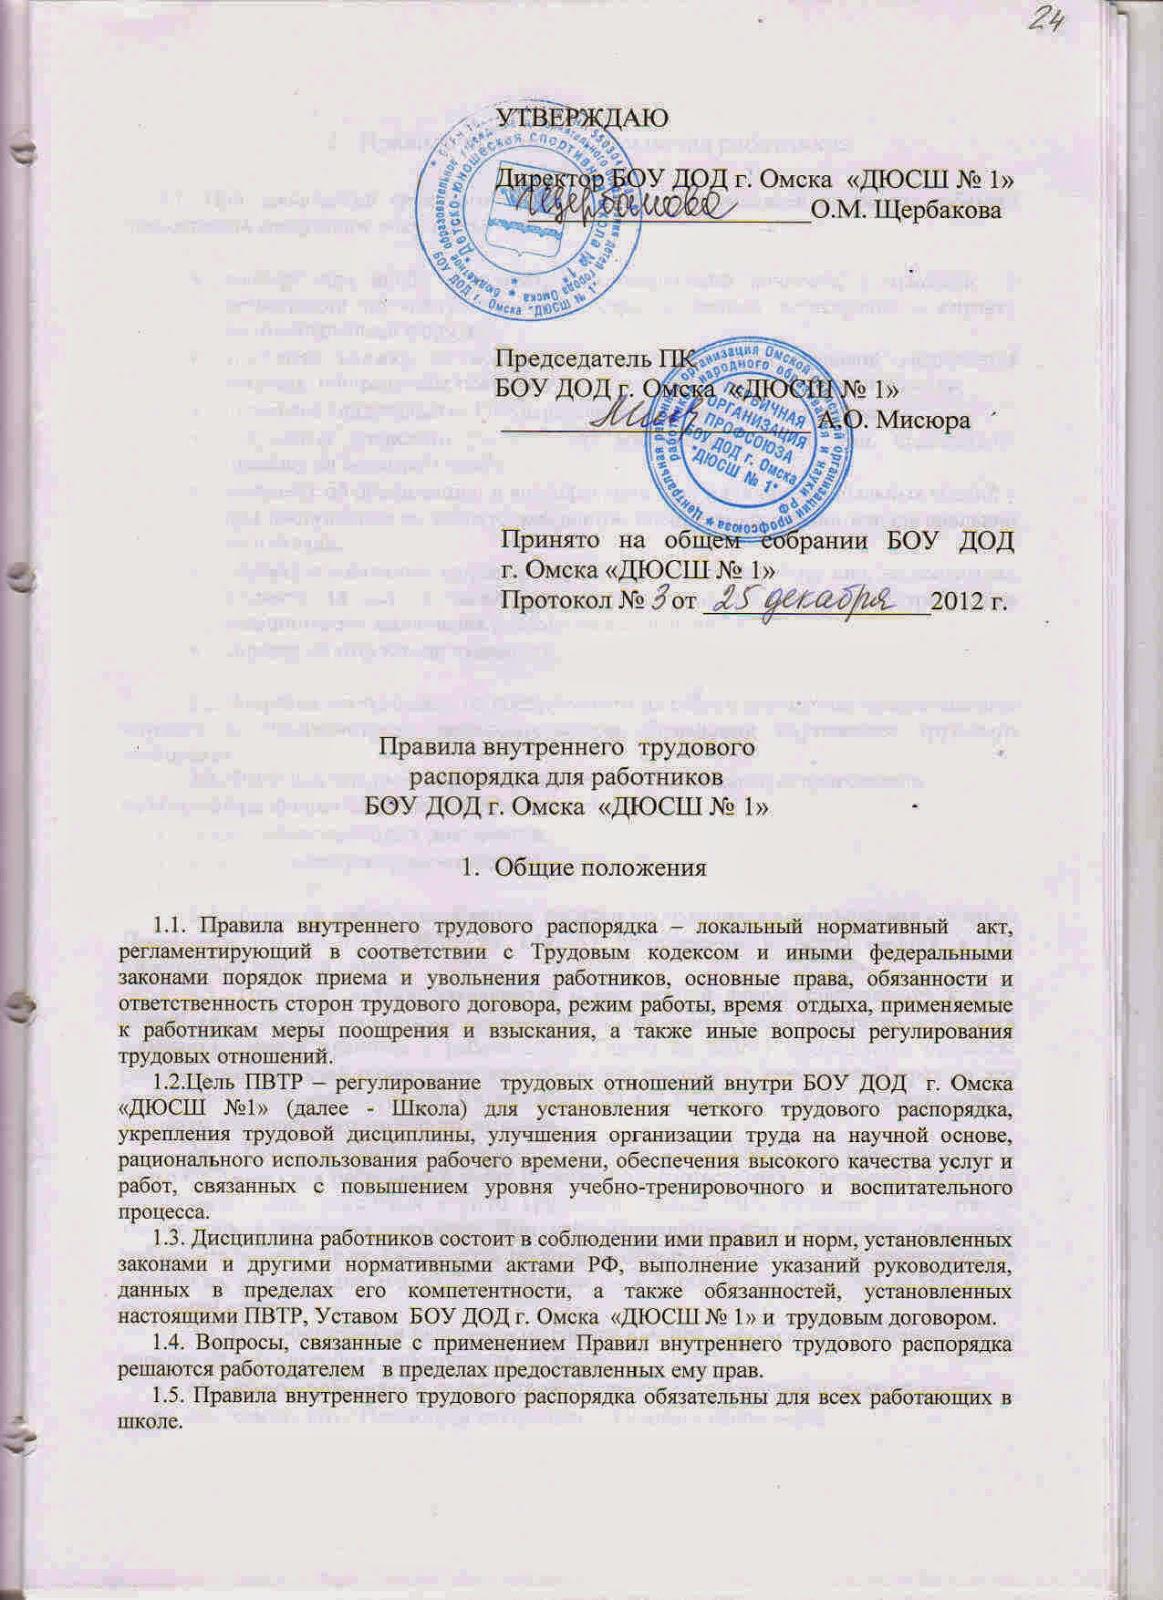 бланк формы 2-ндфл от 06.12.2011г